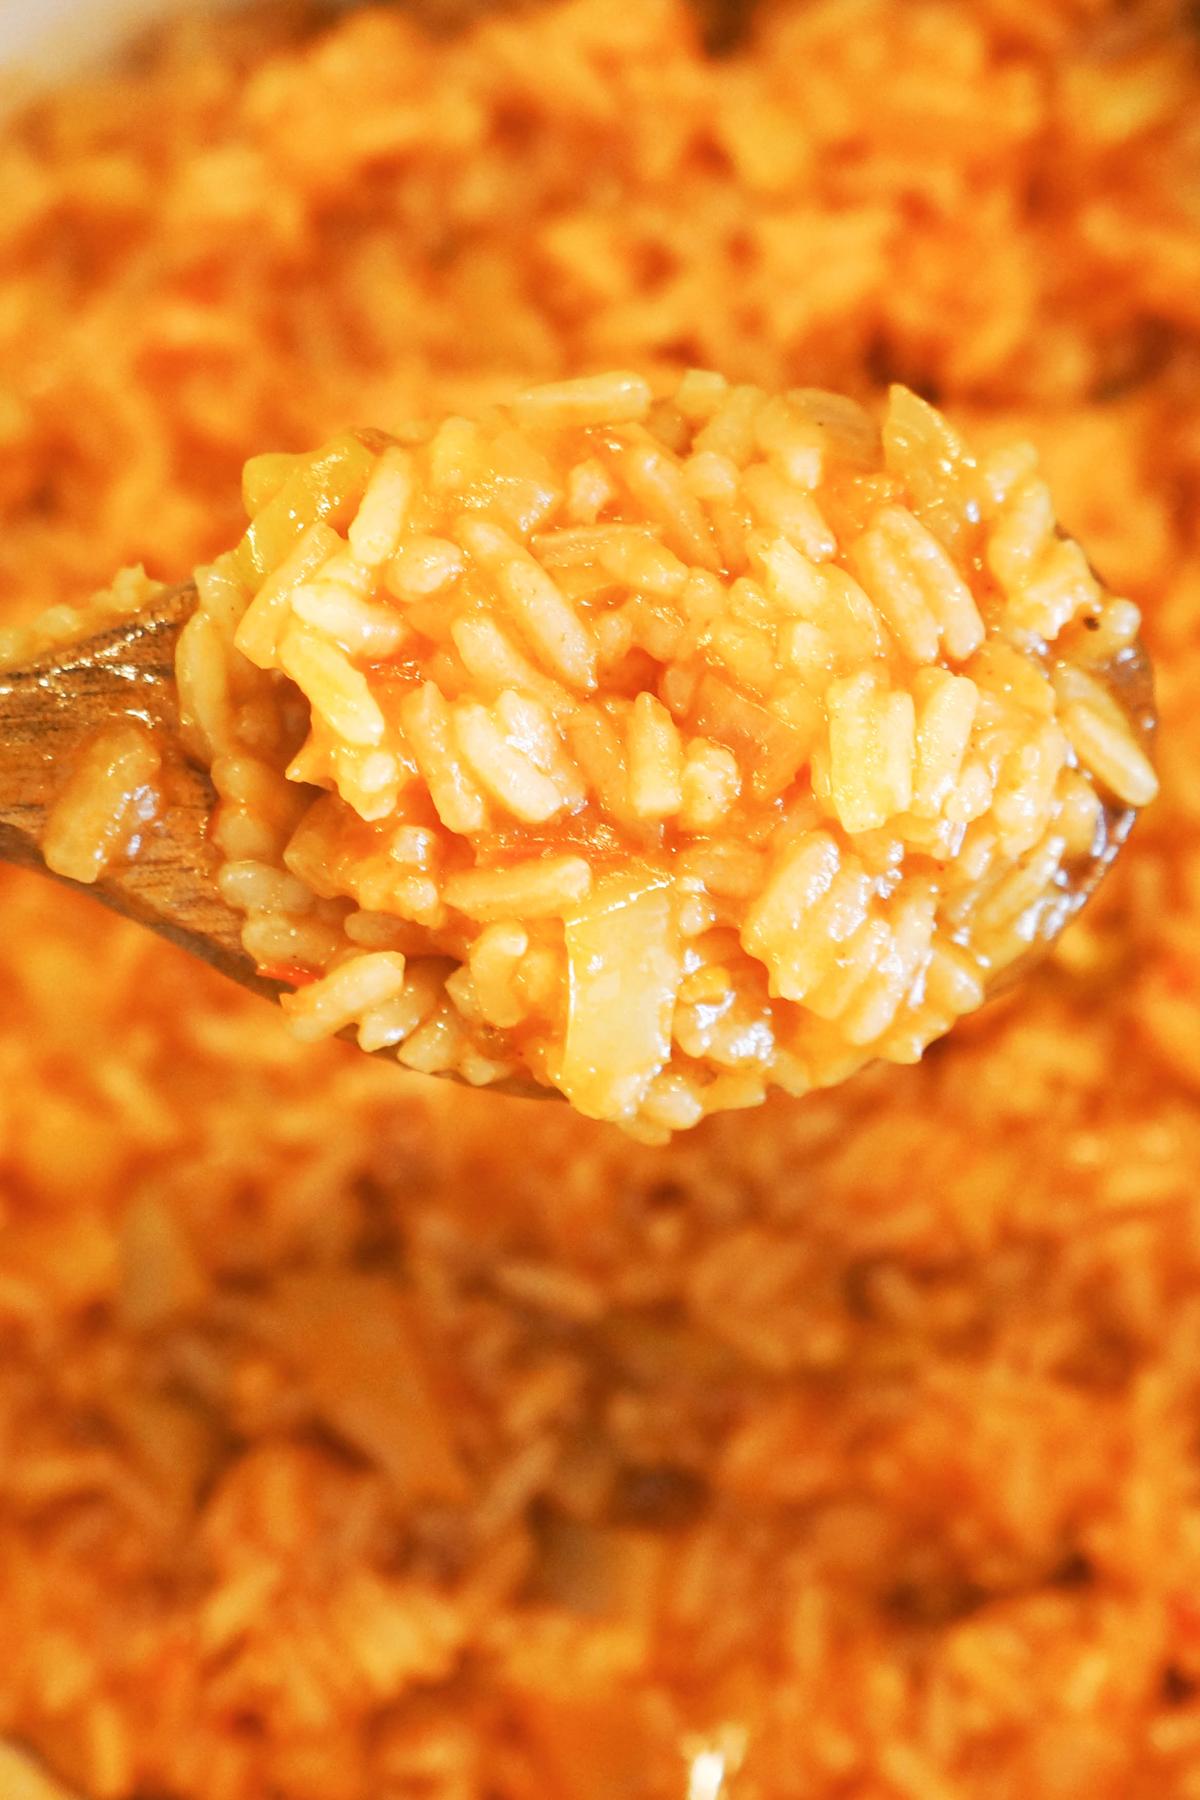 Mehiški rdeči riž